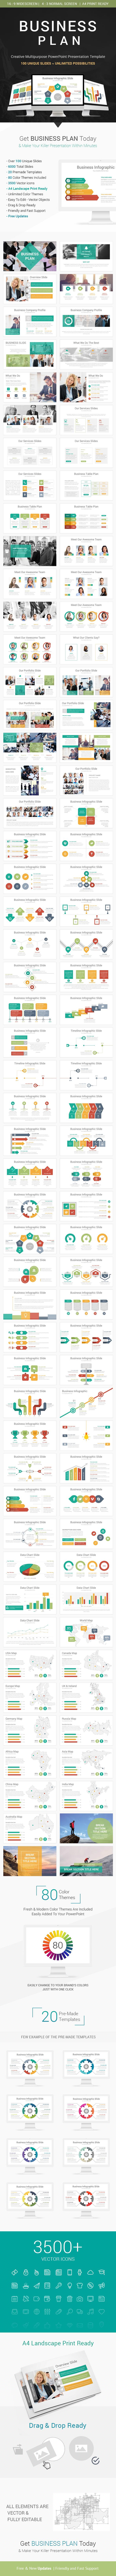 Business Plan PowerPoint Presentation Template - Business PowerPoint Templates